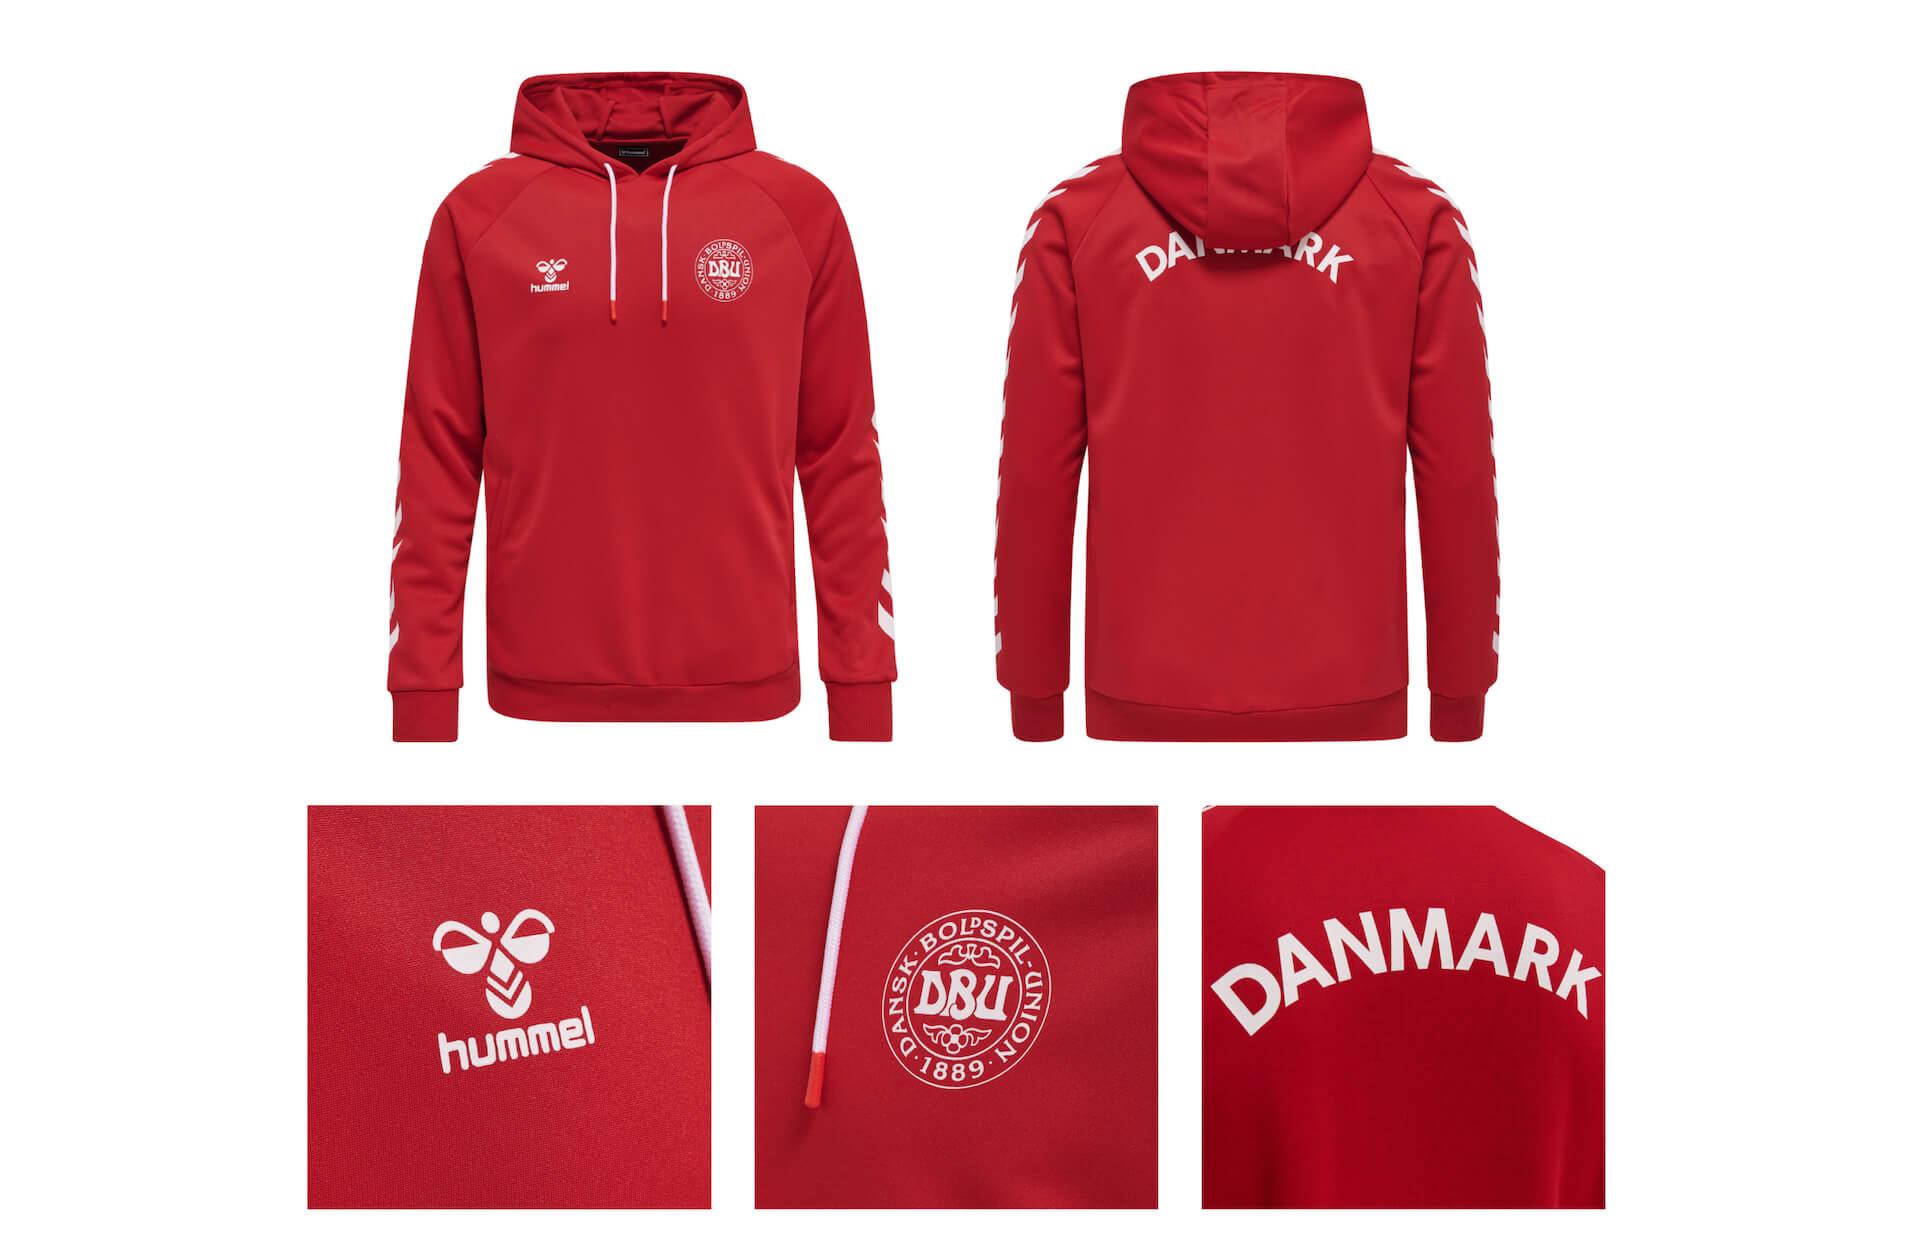 hummelよりデンマーク代表着用のEURO2020ユニフォームが本日より発売開始! fashion210510_hummel-euro2020-210510_9